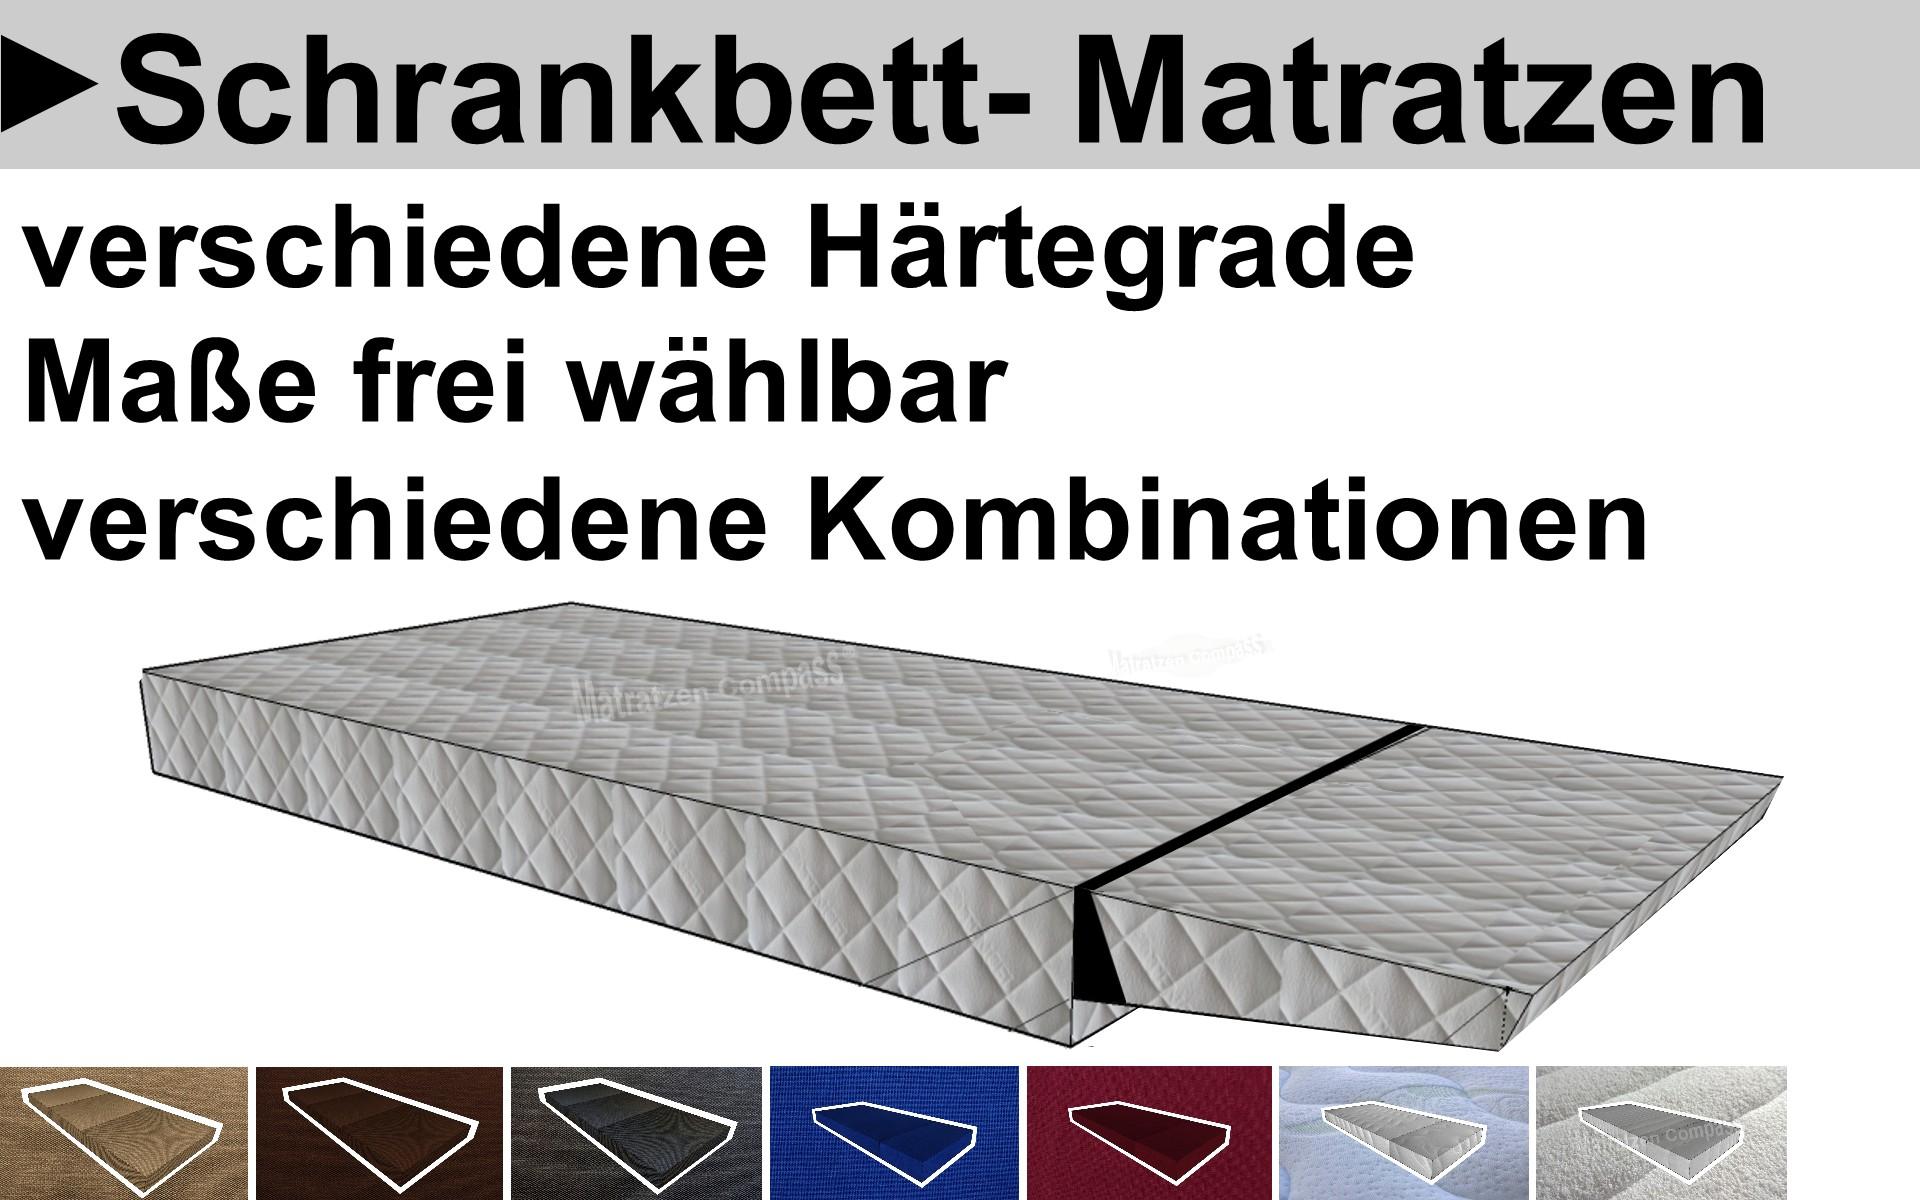 Schrankbettmatratze-Schrankbettmatratzen-Schrankbett-Matratze-Matratzen-fuer-Schrankbetten-Schrankklappbett-Matratze-Wandklappbett-Matratze-Matratzen-Compass